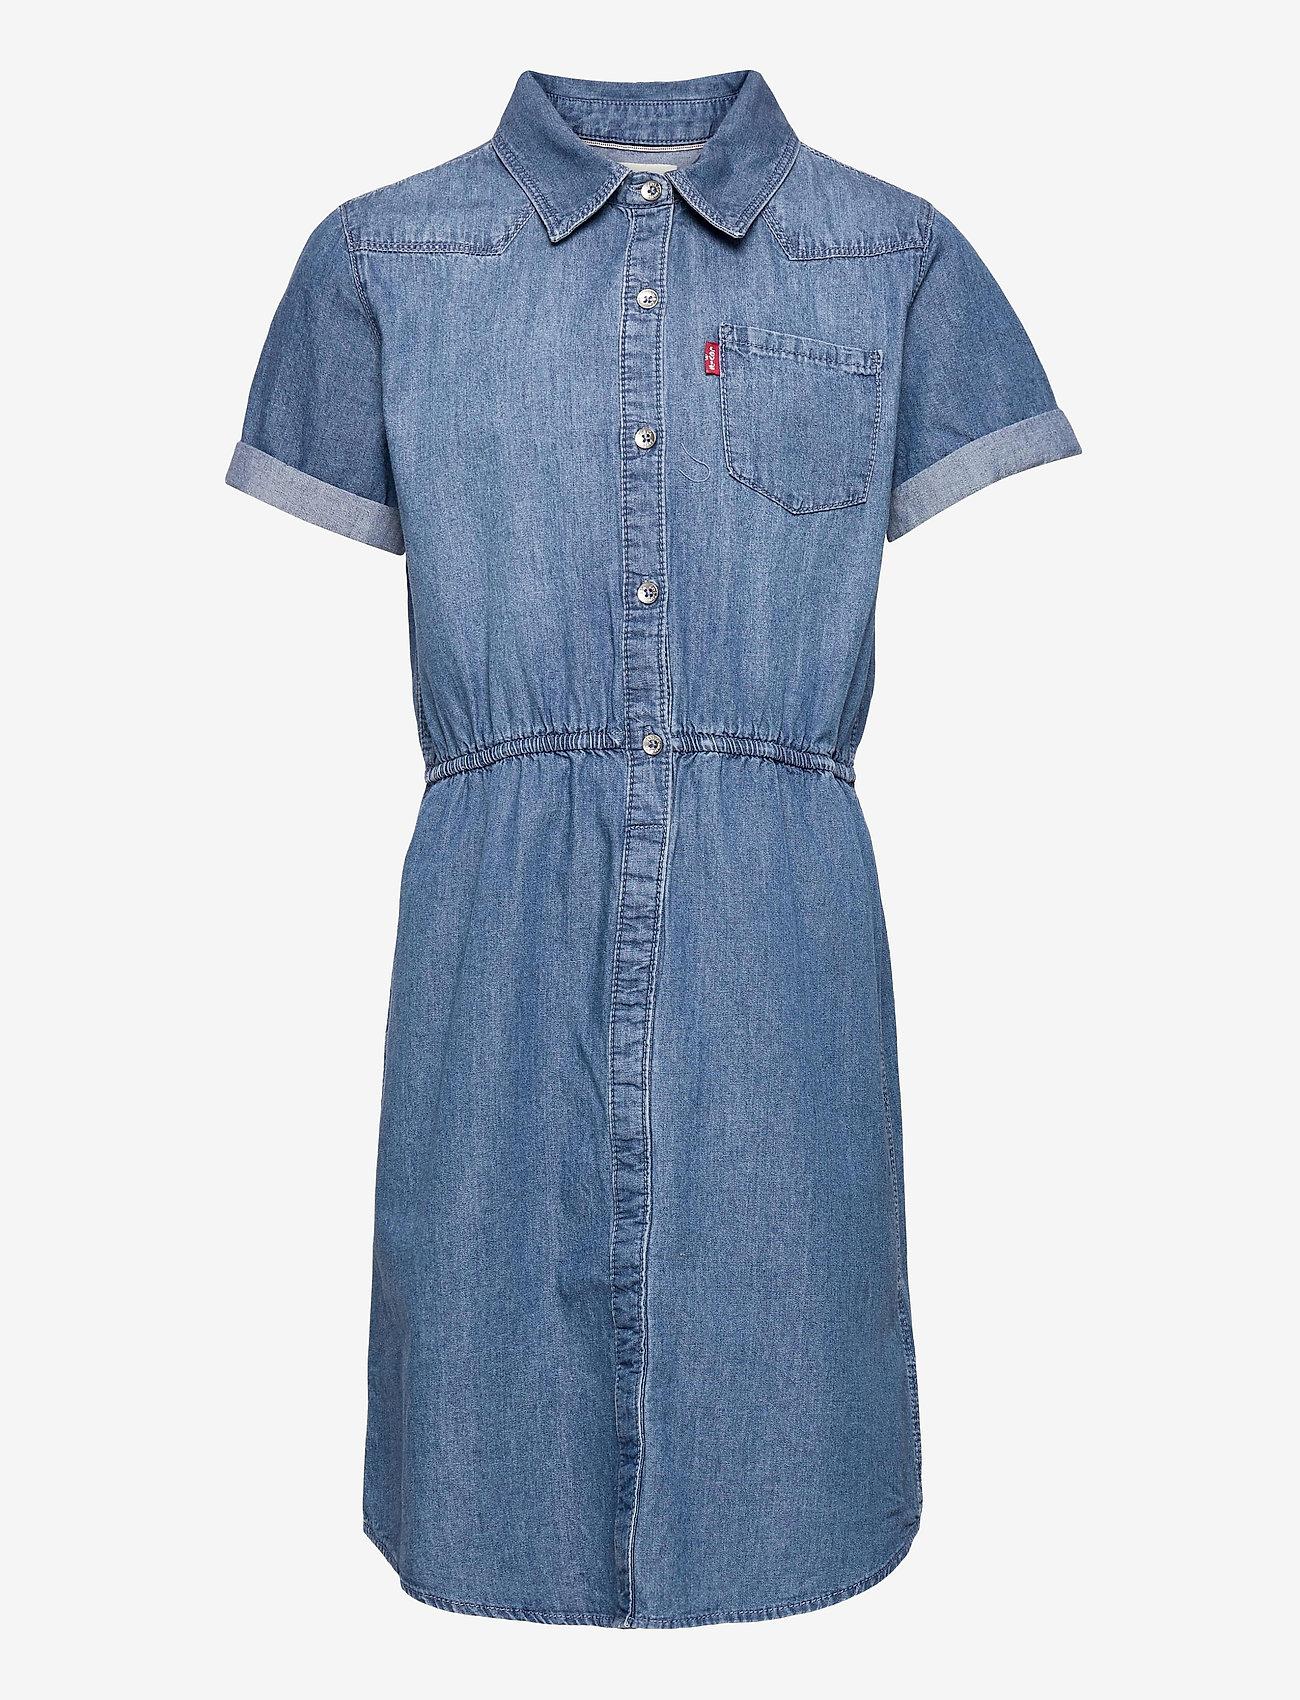 Levi's - LVG WOVEN DRESS - kleider - milestone - 0